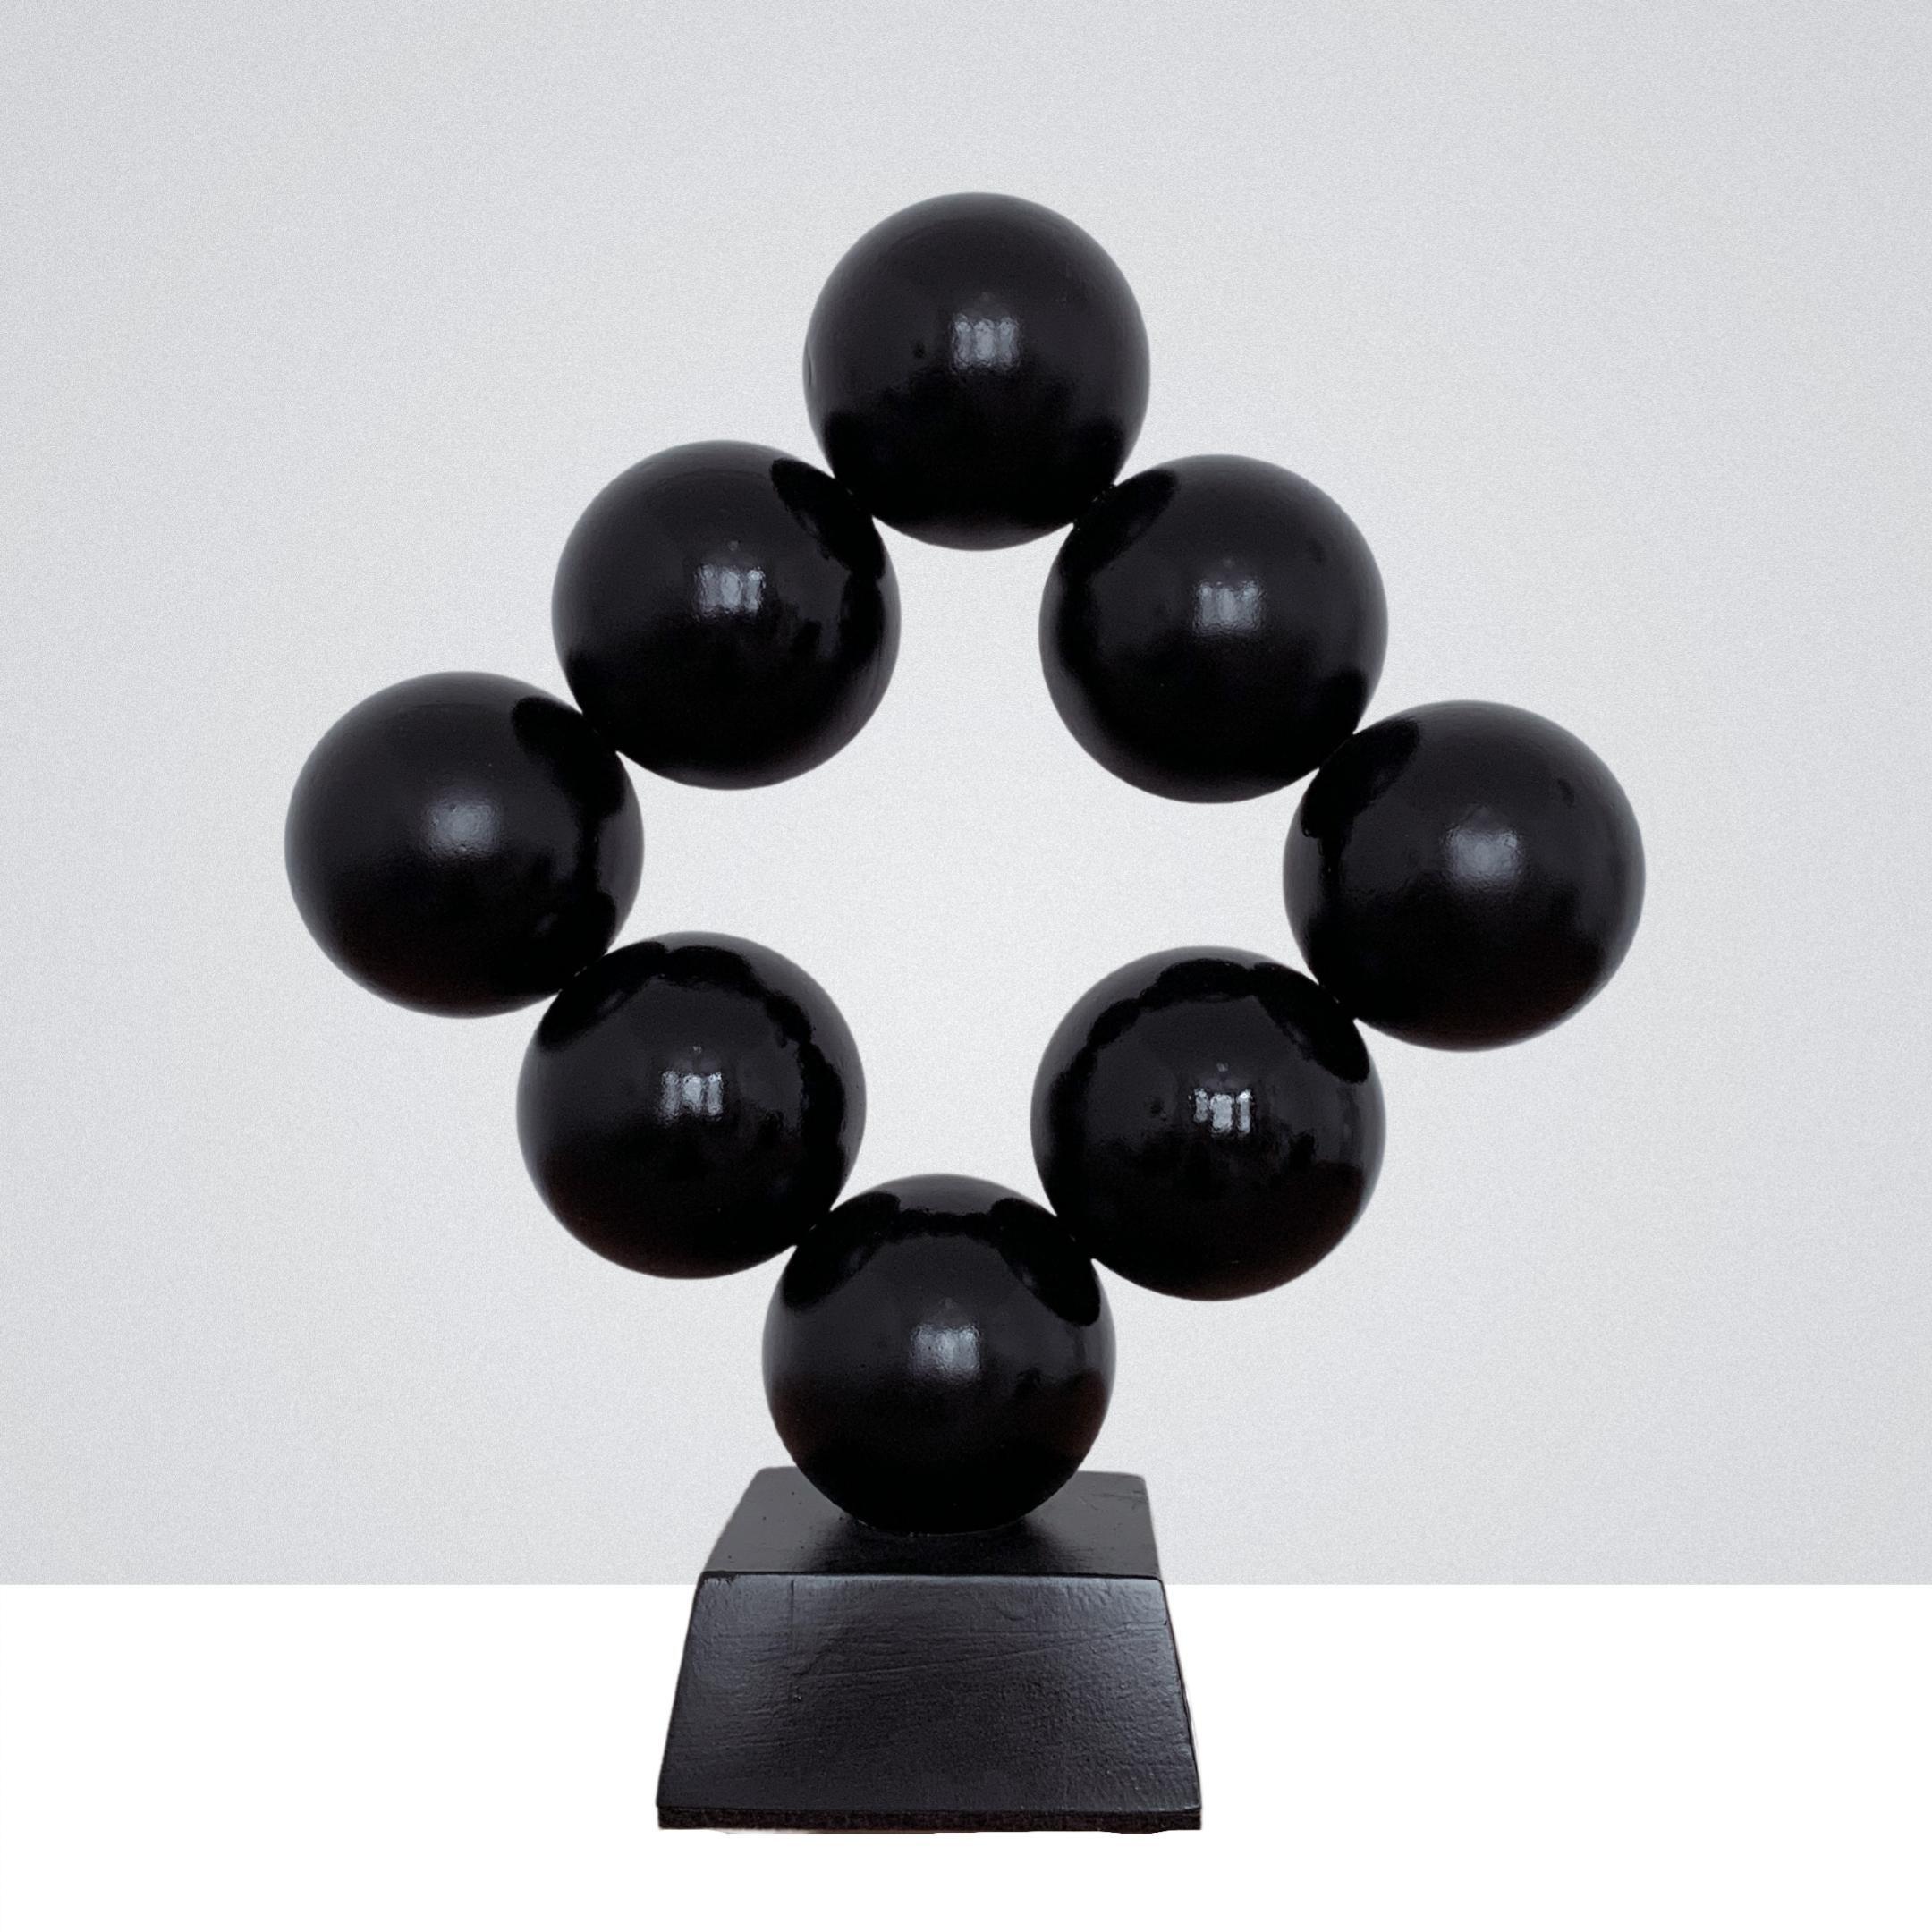 Black Rhombus Steel Office Cabinet Interior Sculpture